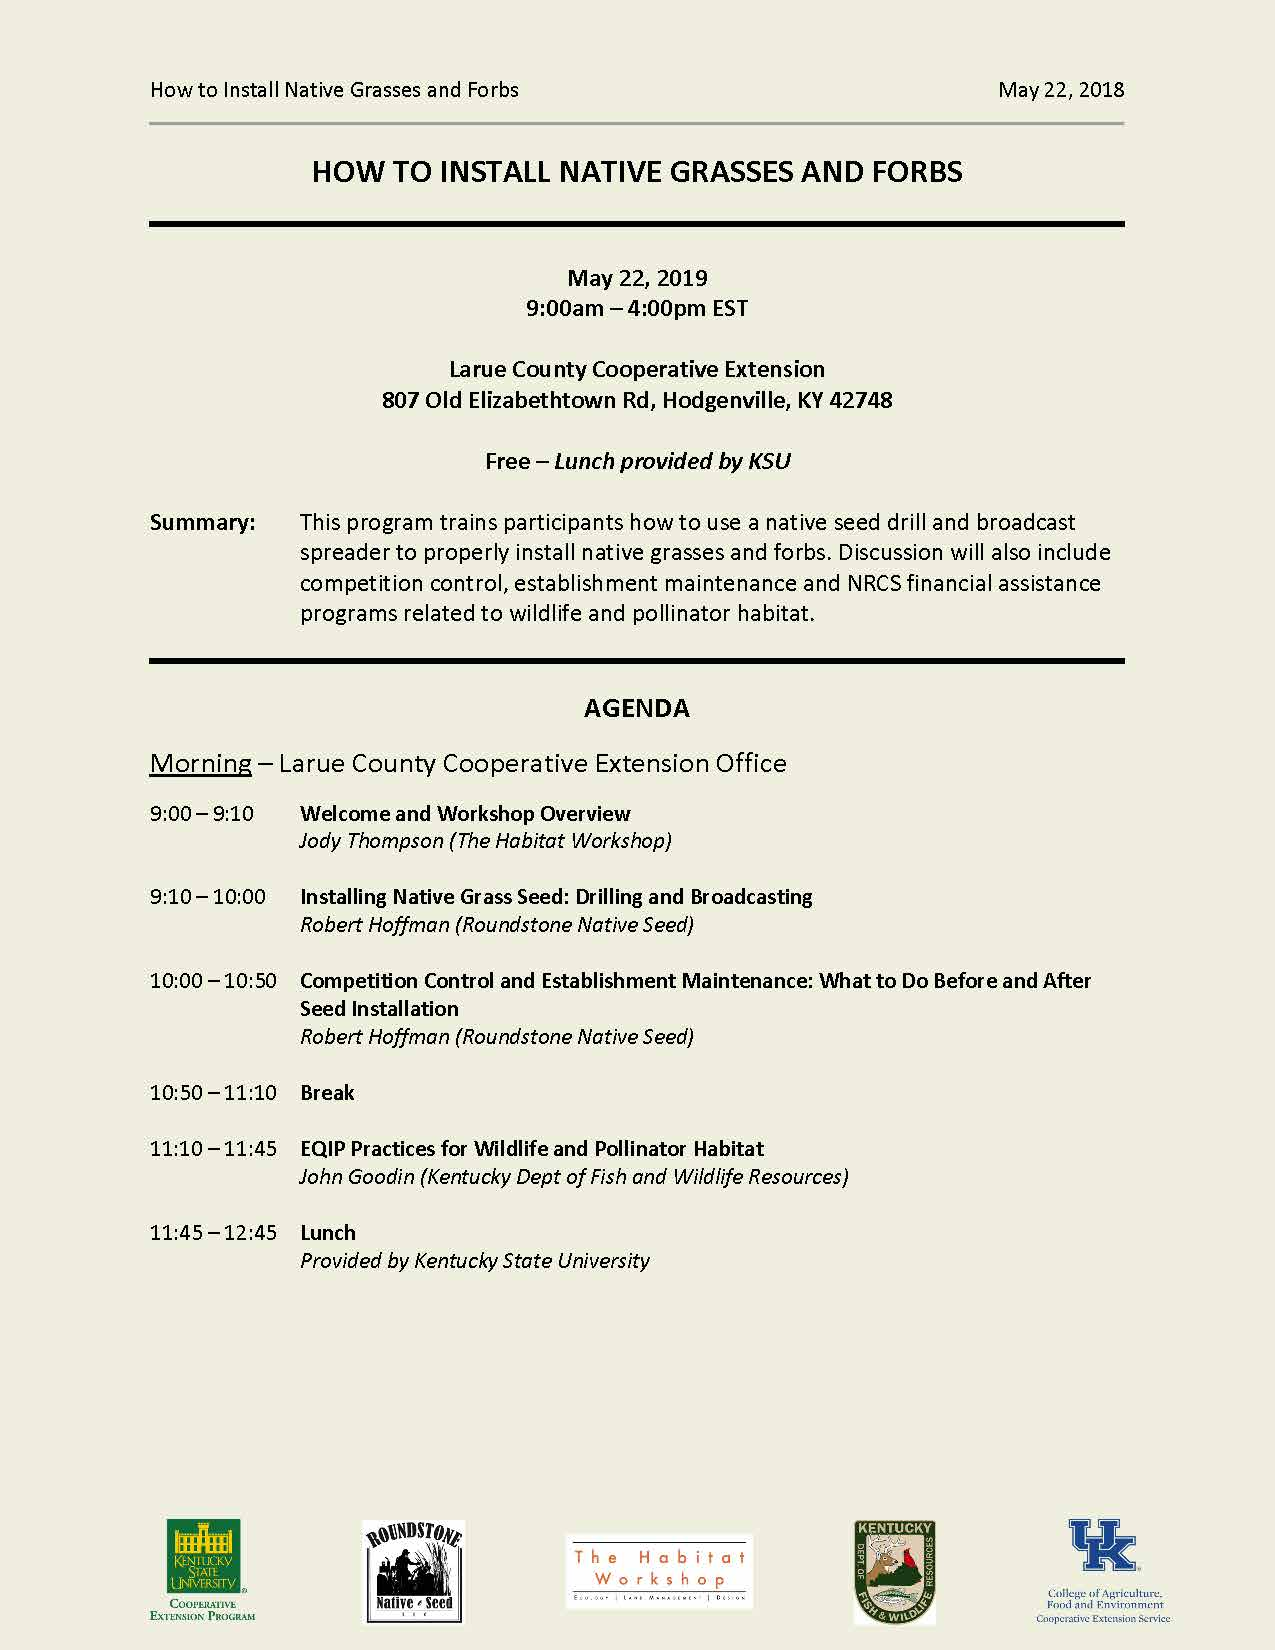 Agenda_Page_1.jpg